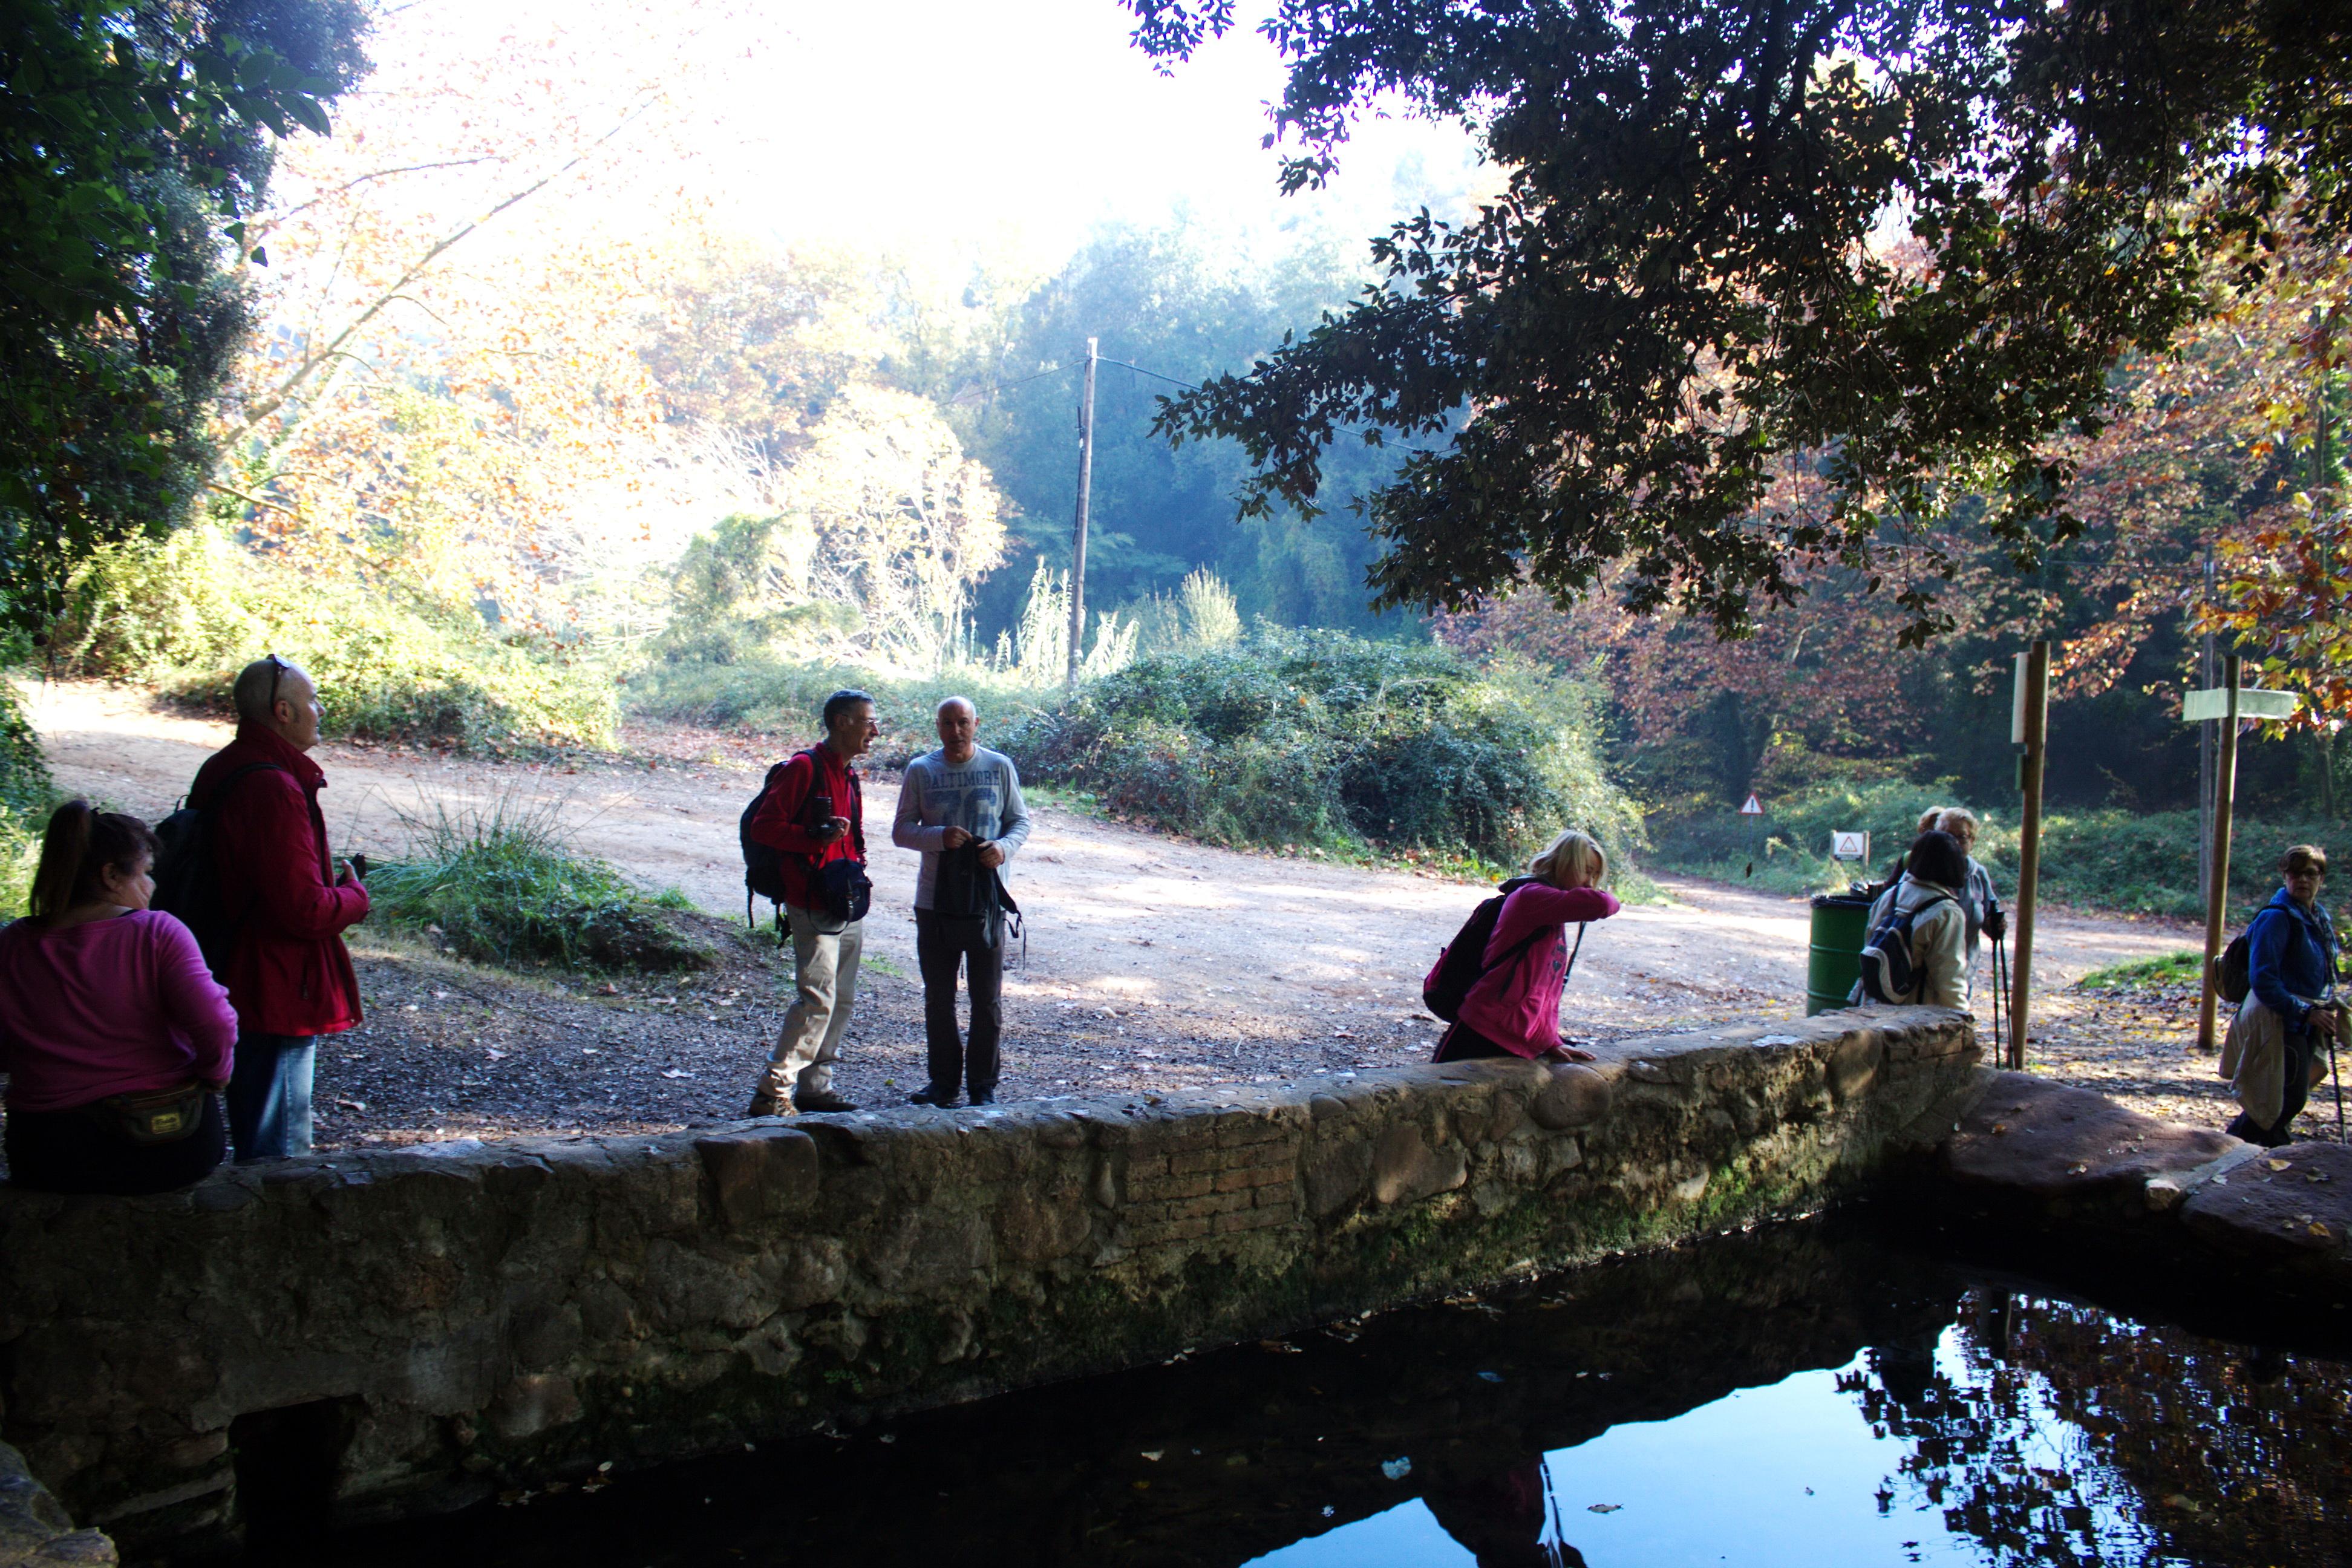 Font de Can Moragues Safareig